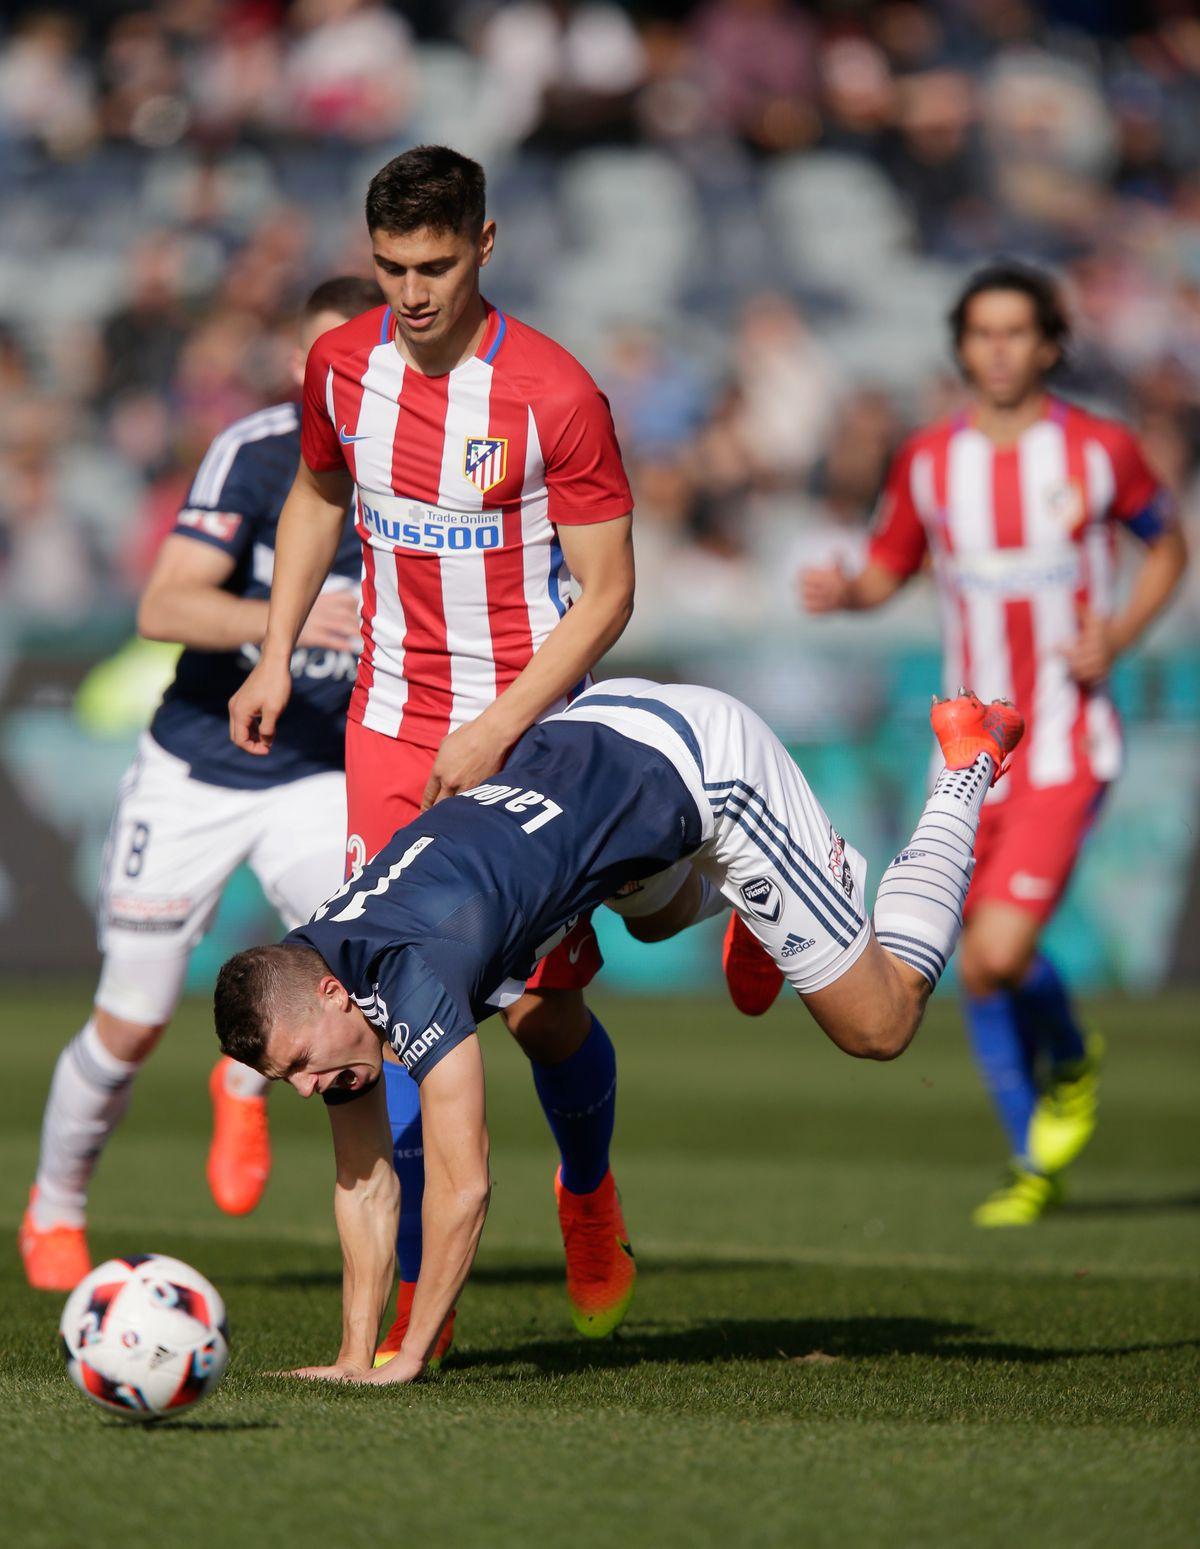 Melbourne Victory v Atletico de Madrid